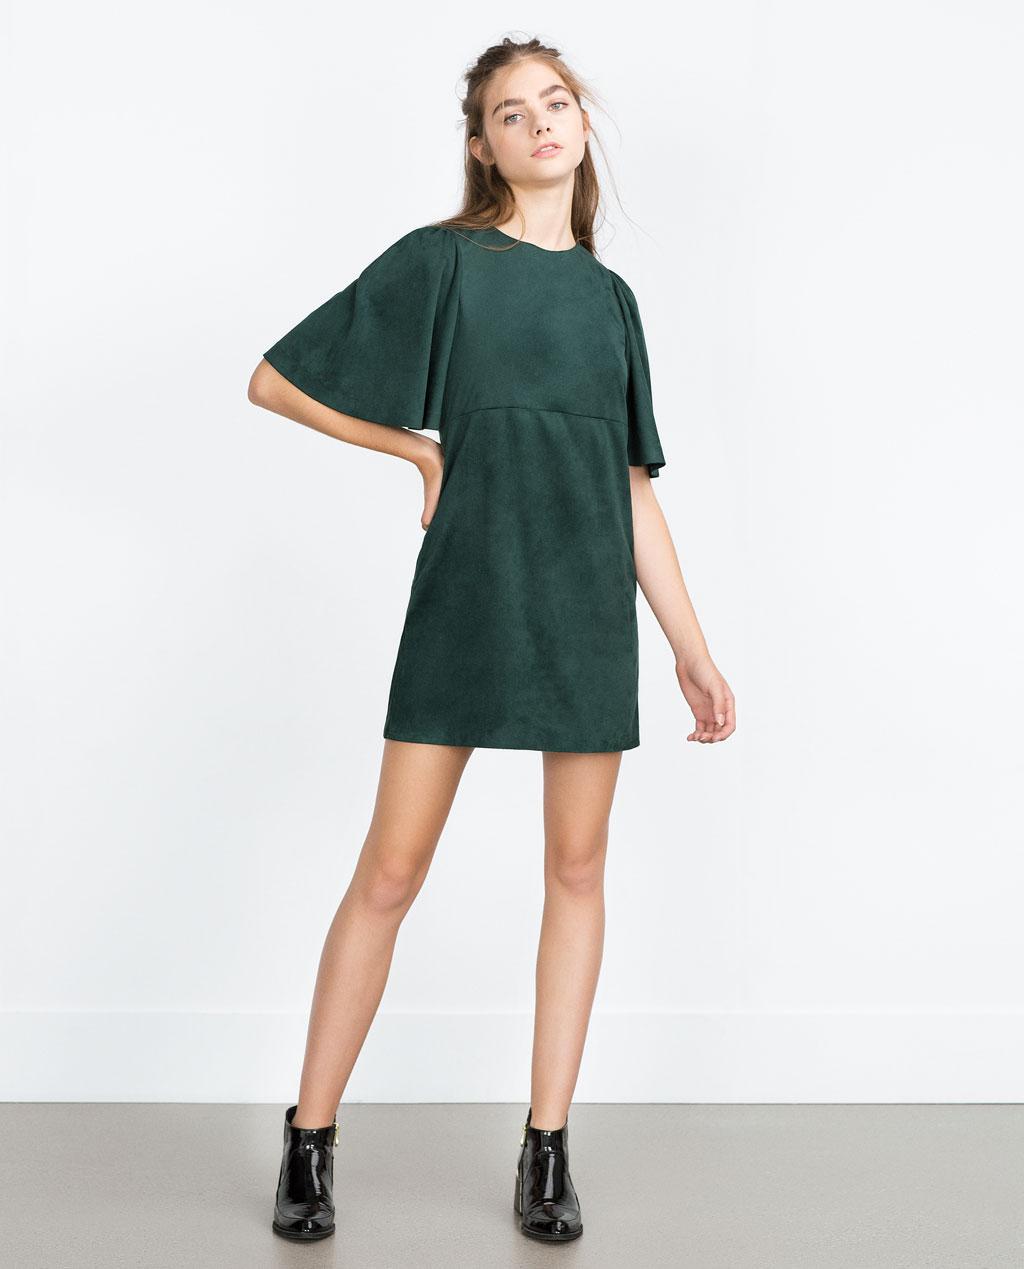 Zara - Robe en suédine